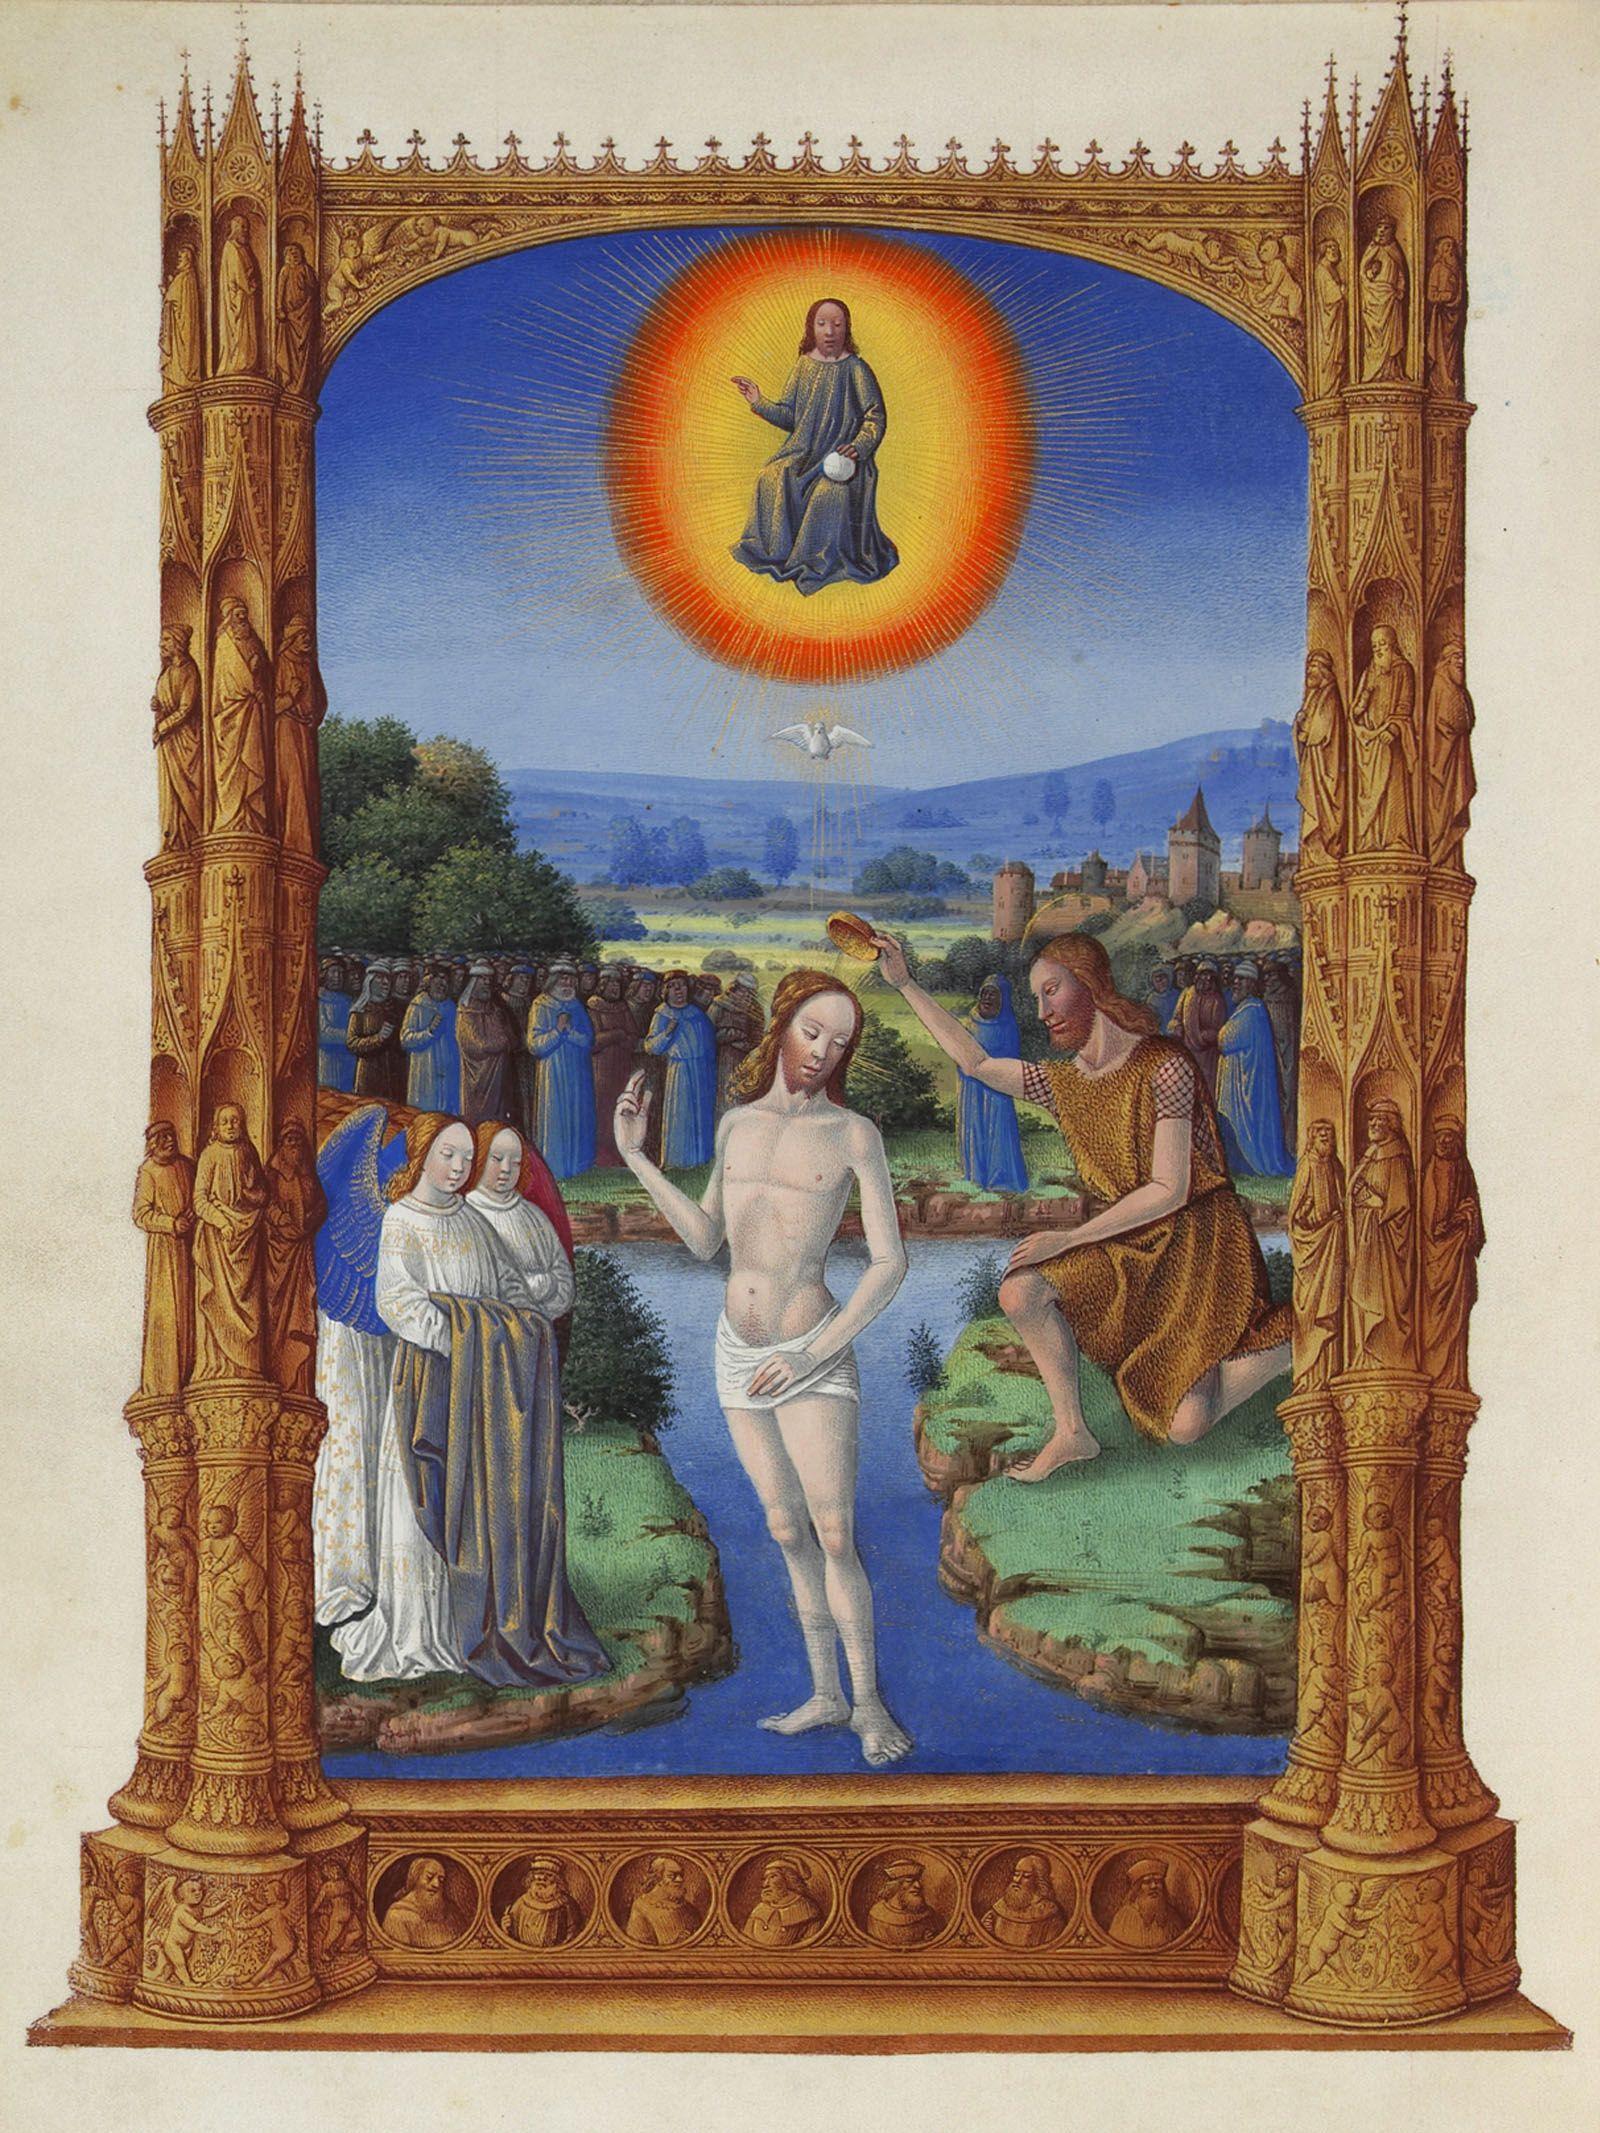 Folio_109v_-_The_Baptism_of_Christ.jpg